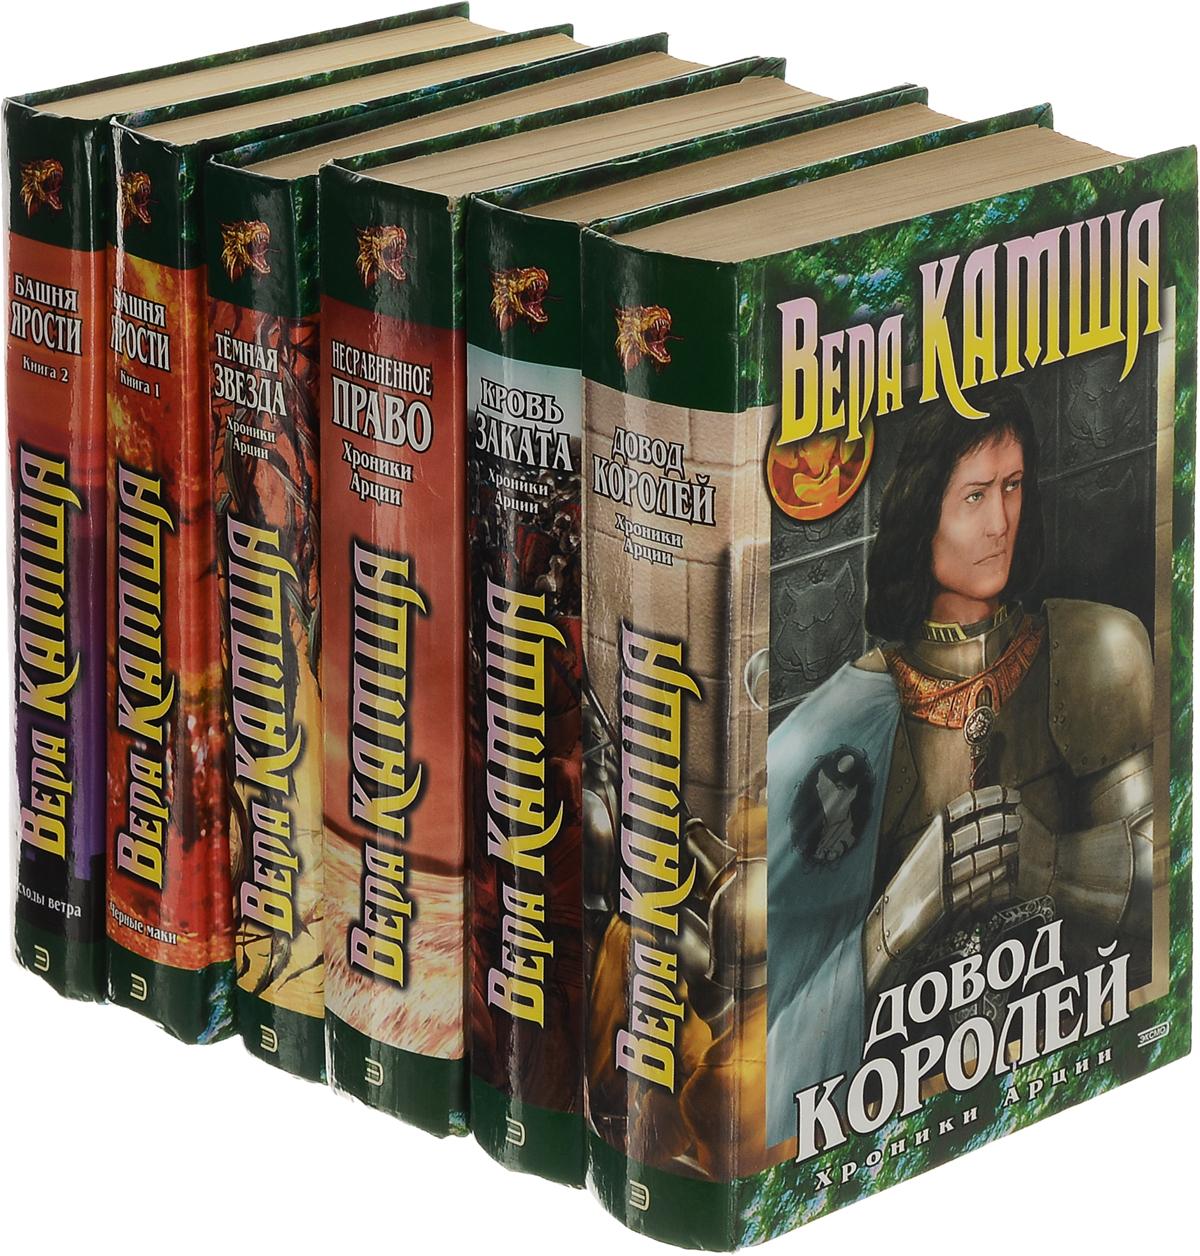 Вера Камша Хроники Арции (комплект из 6 книг)